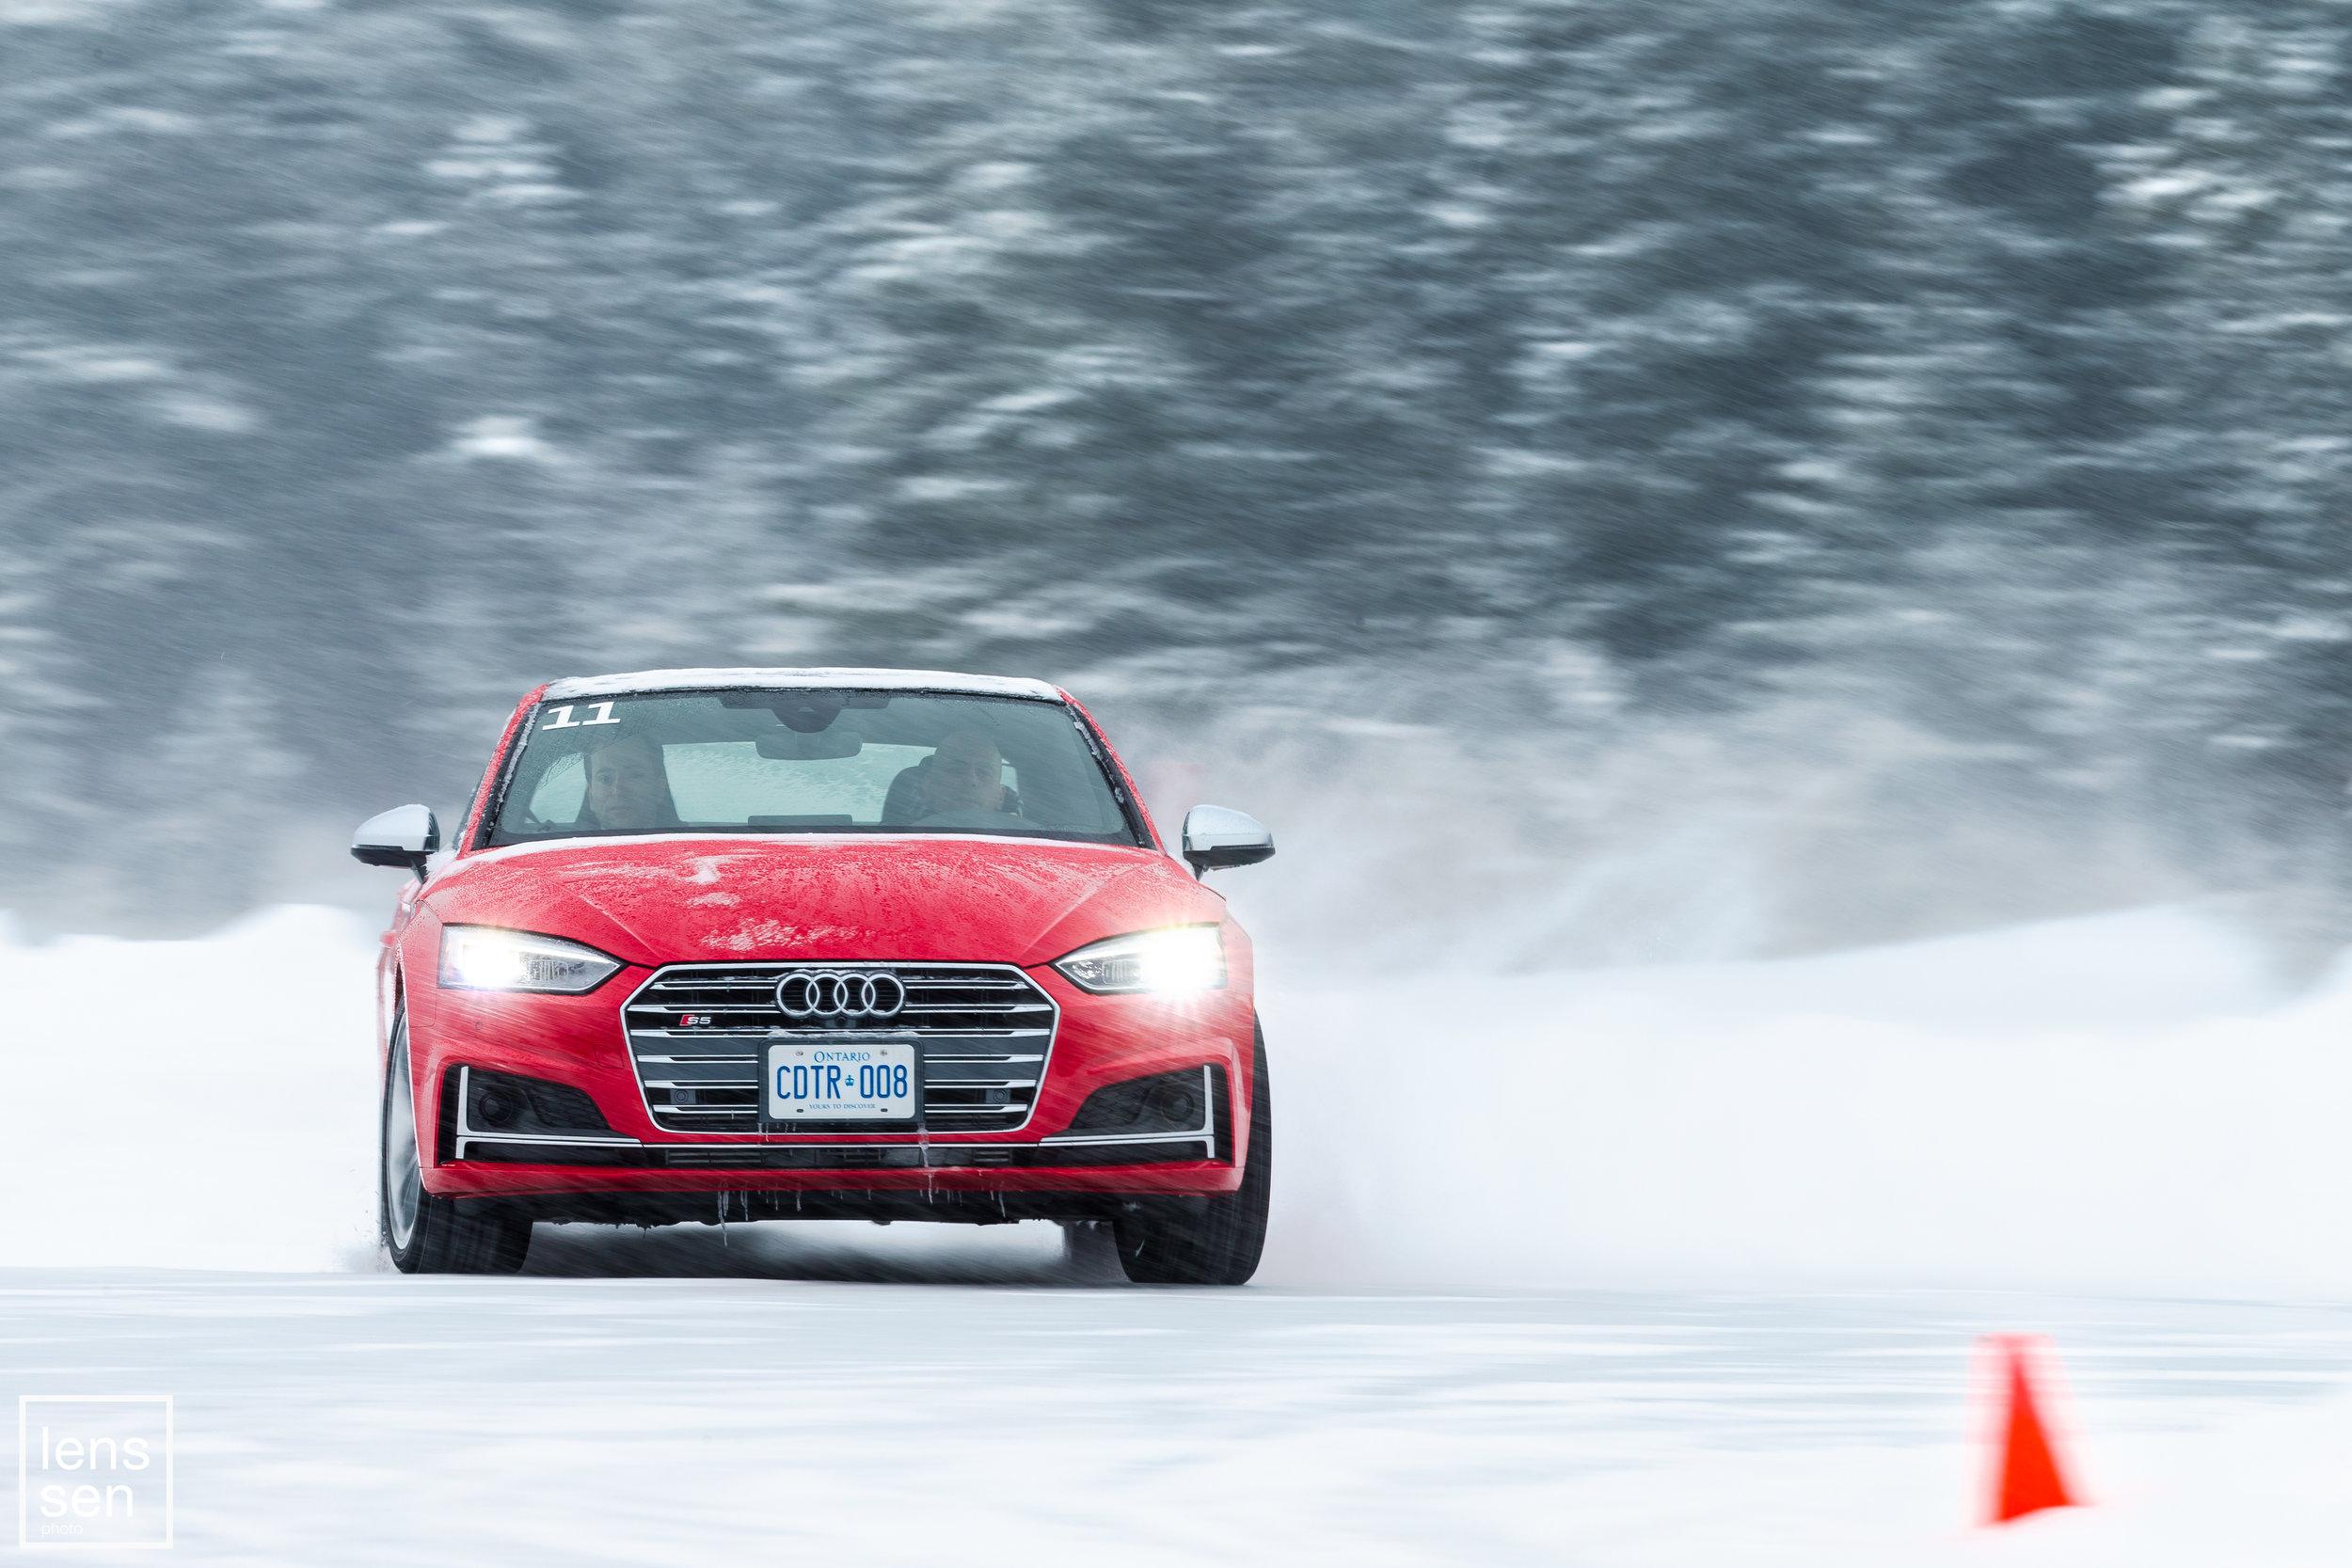 Audi Ice Experience - Sacacomie QC - Feb 2018-_L2_3205.jpg